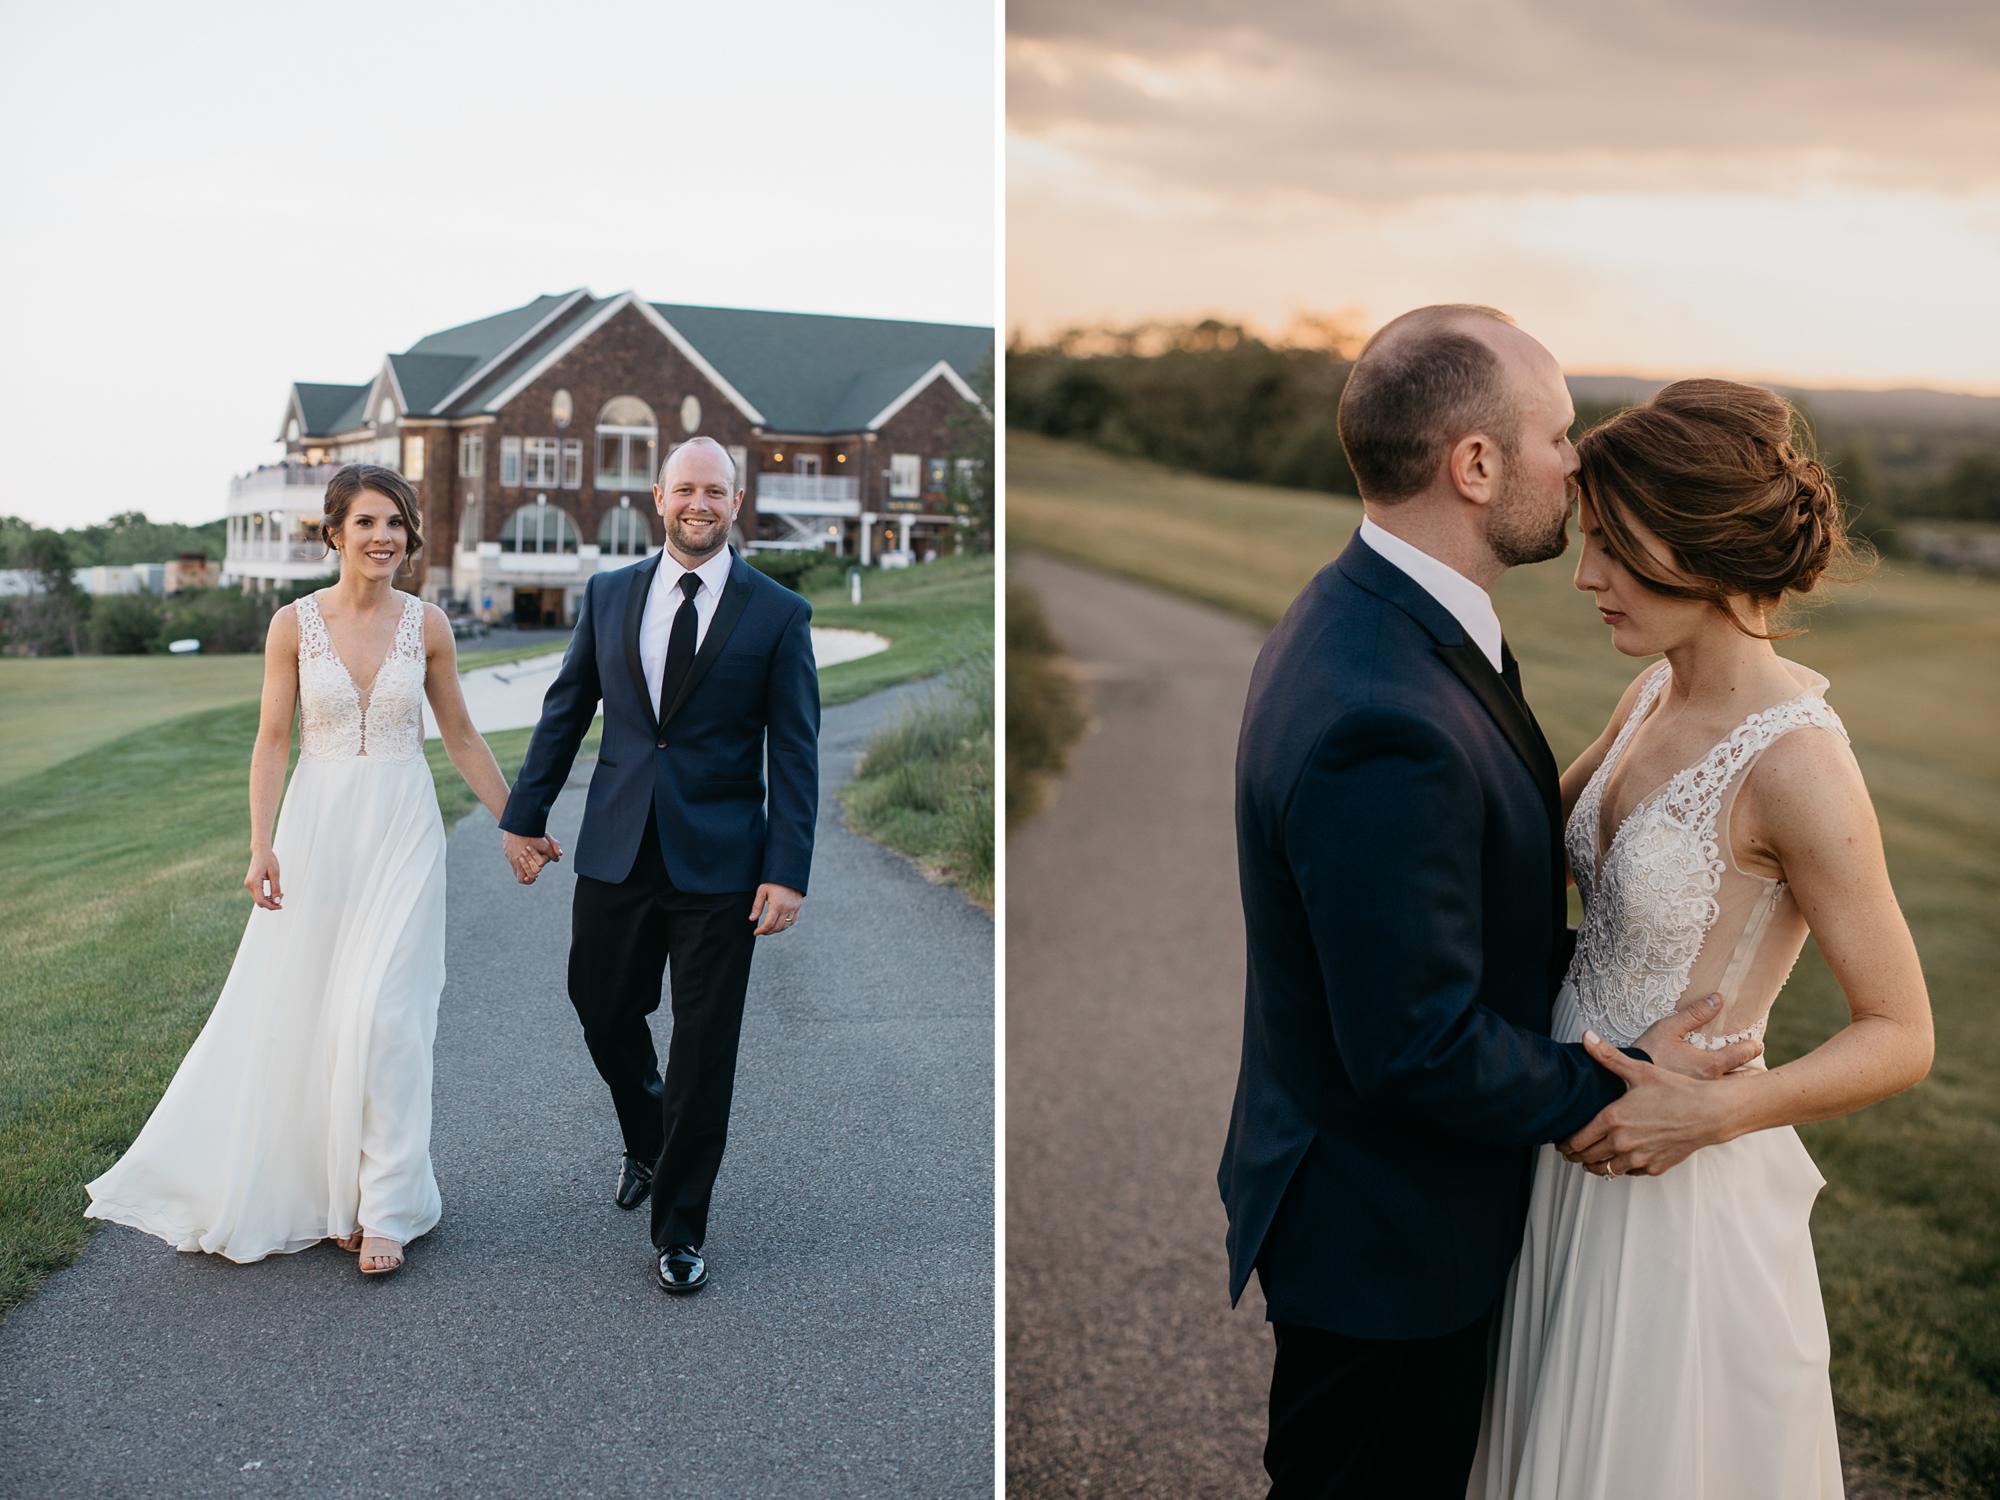 Jaclyn_Andrew_quincy_massachusetts_wedding029.jpg